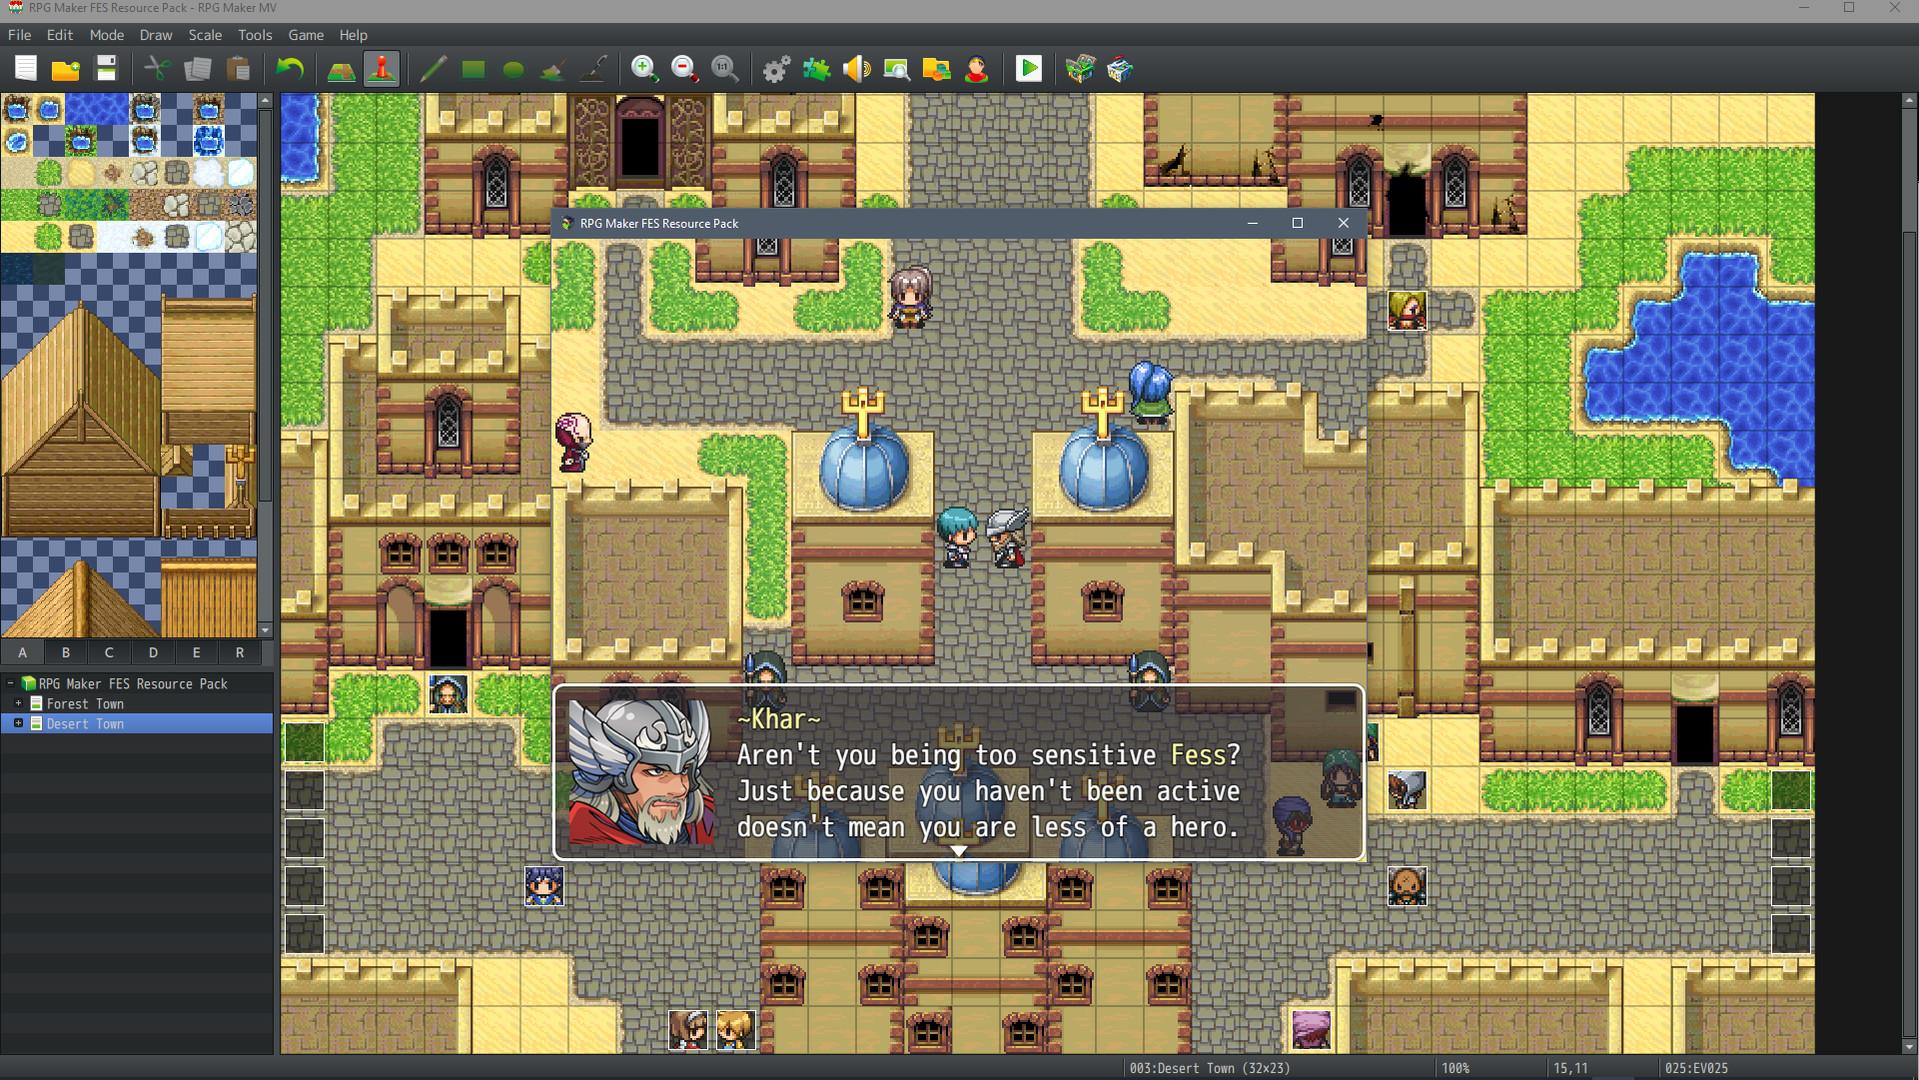 RPG Maker MV - FES Resource Pack on Steam